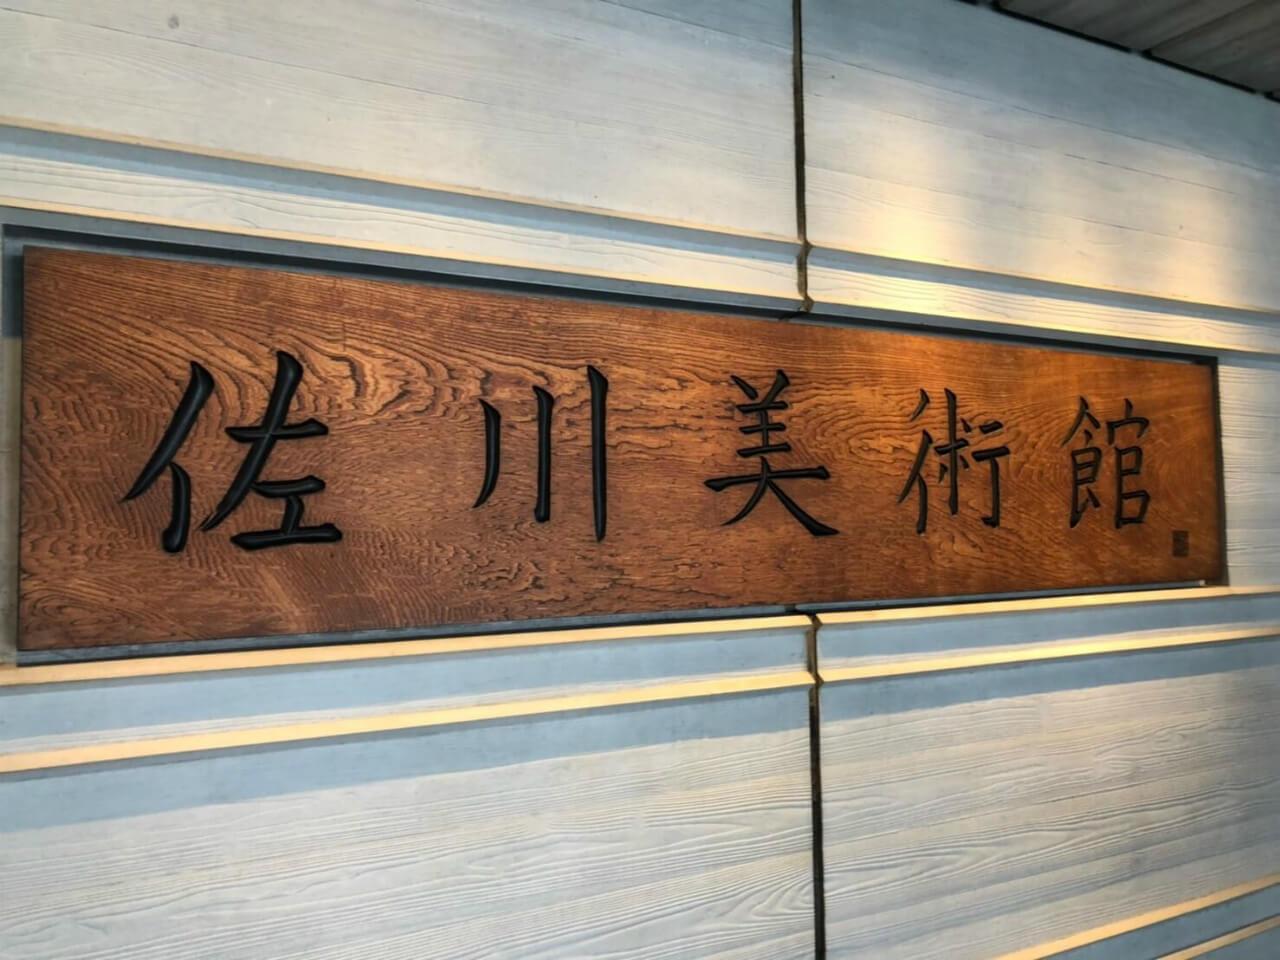 20190203佐川美術館アリス展_190204_0043